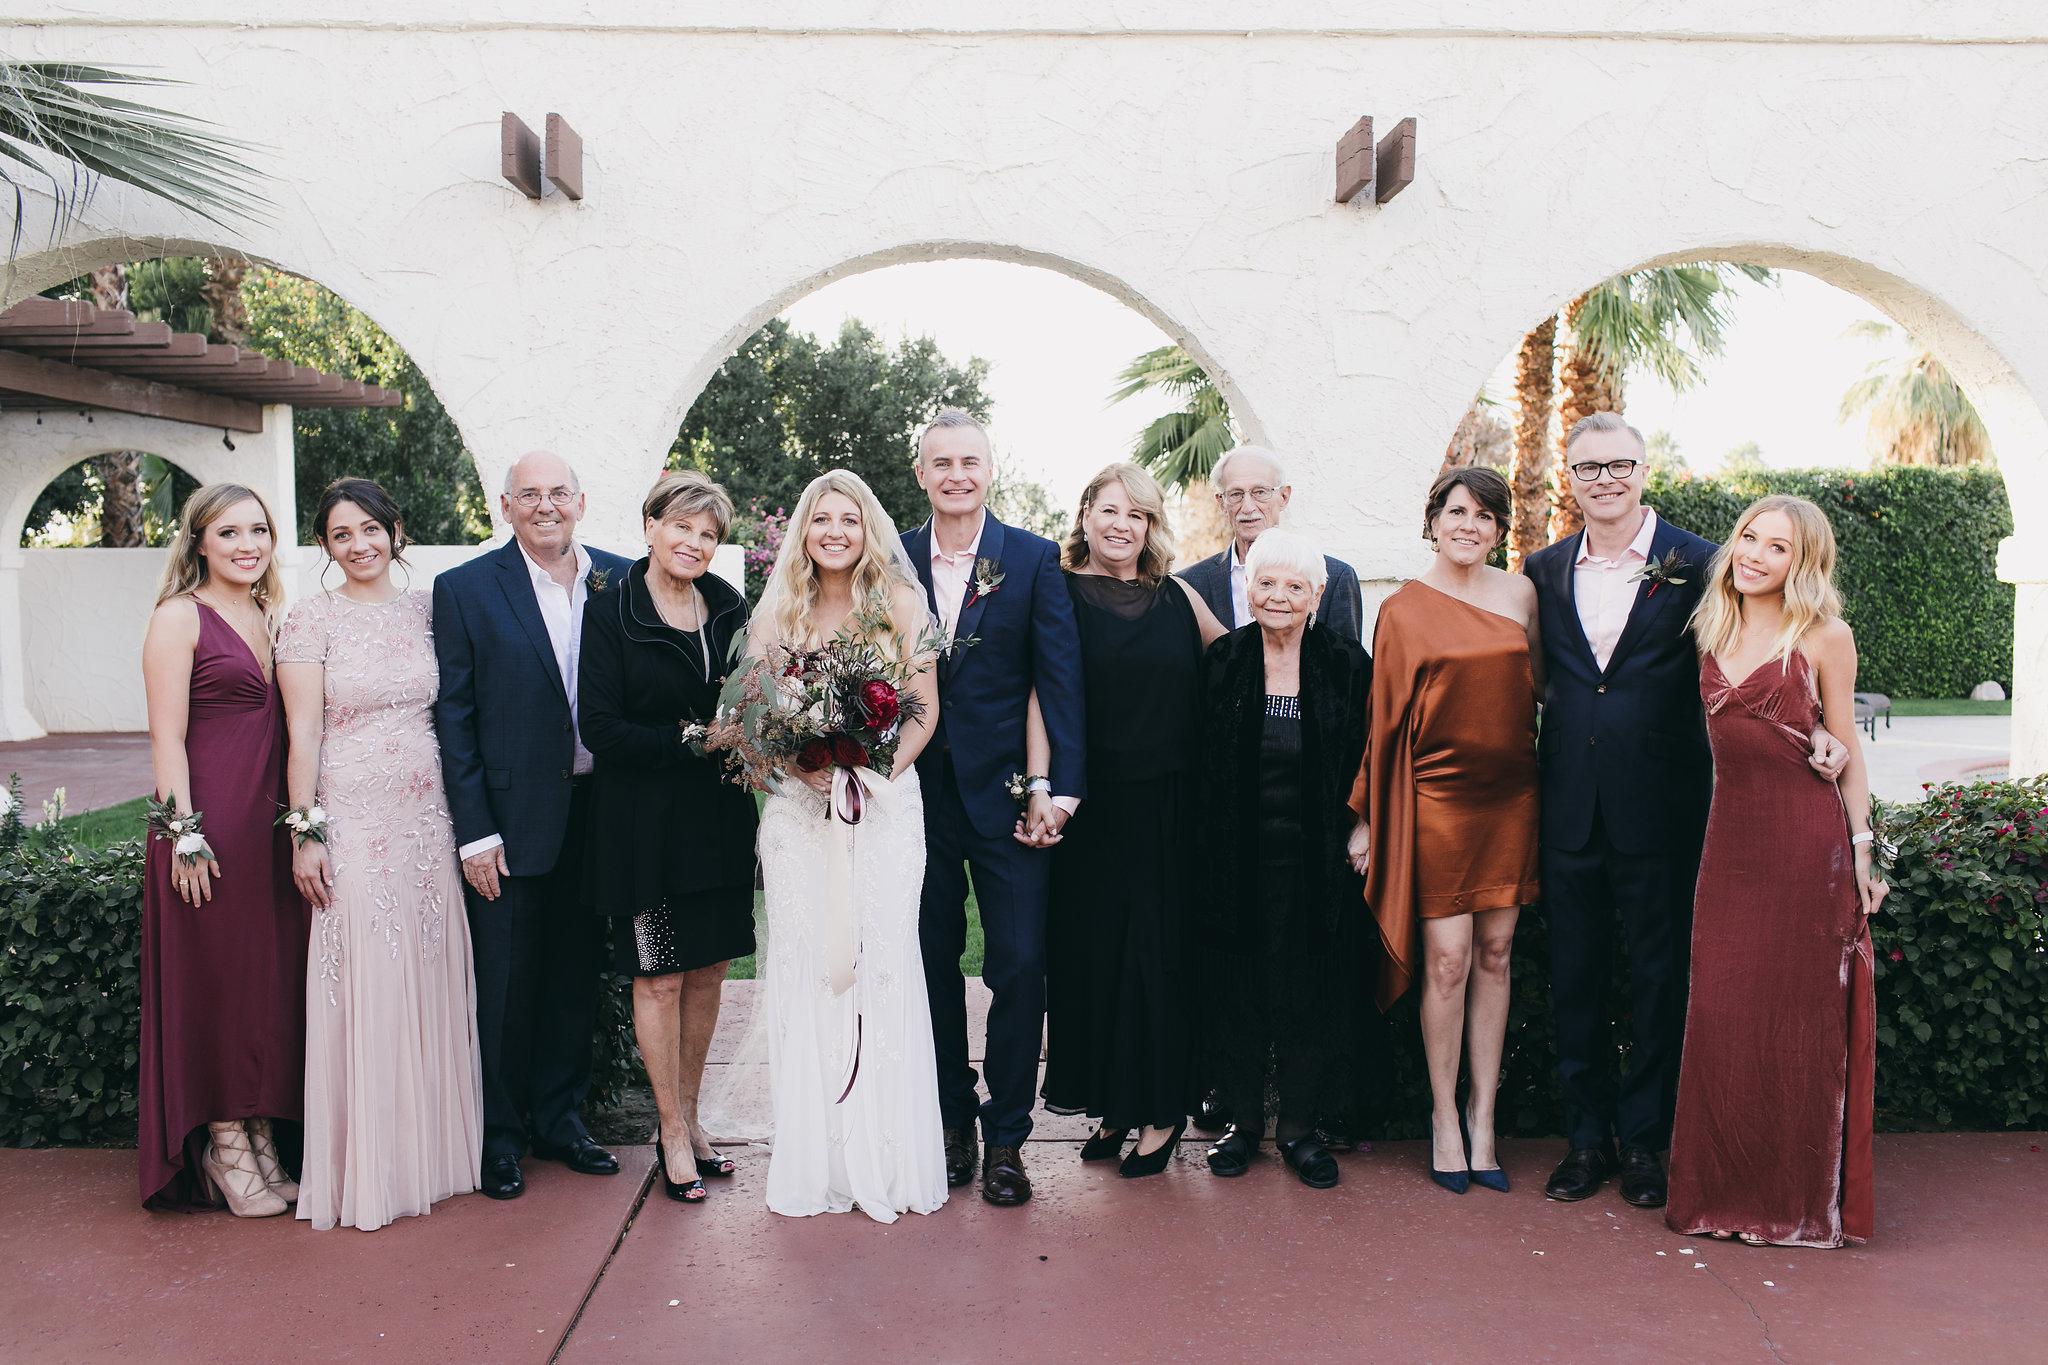 Gracy-Andrew-Wedding-371.jpg